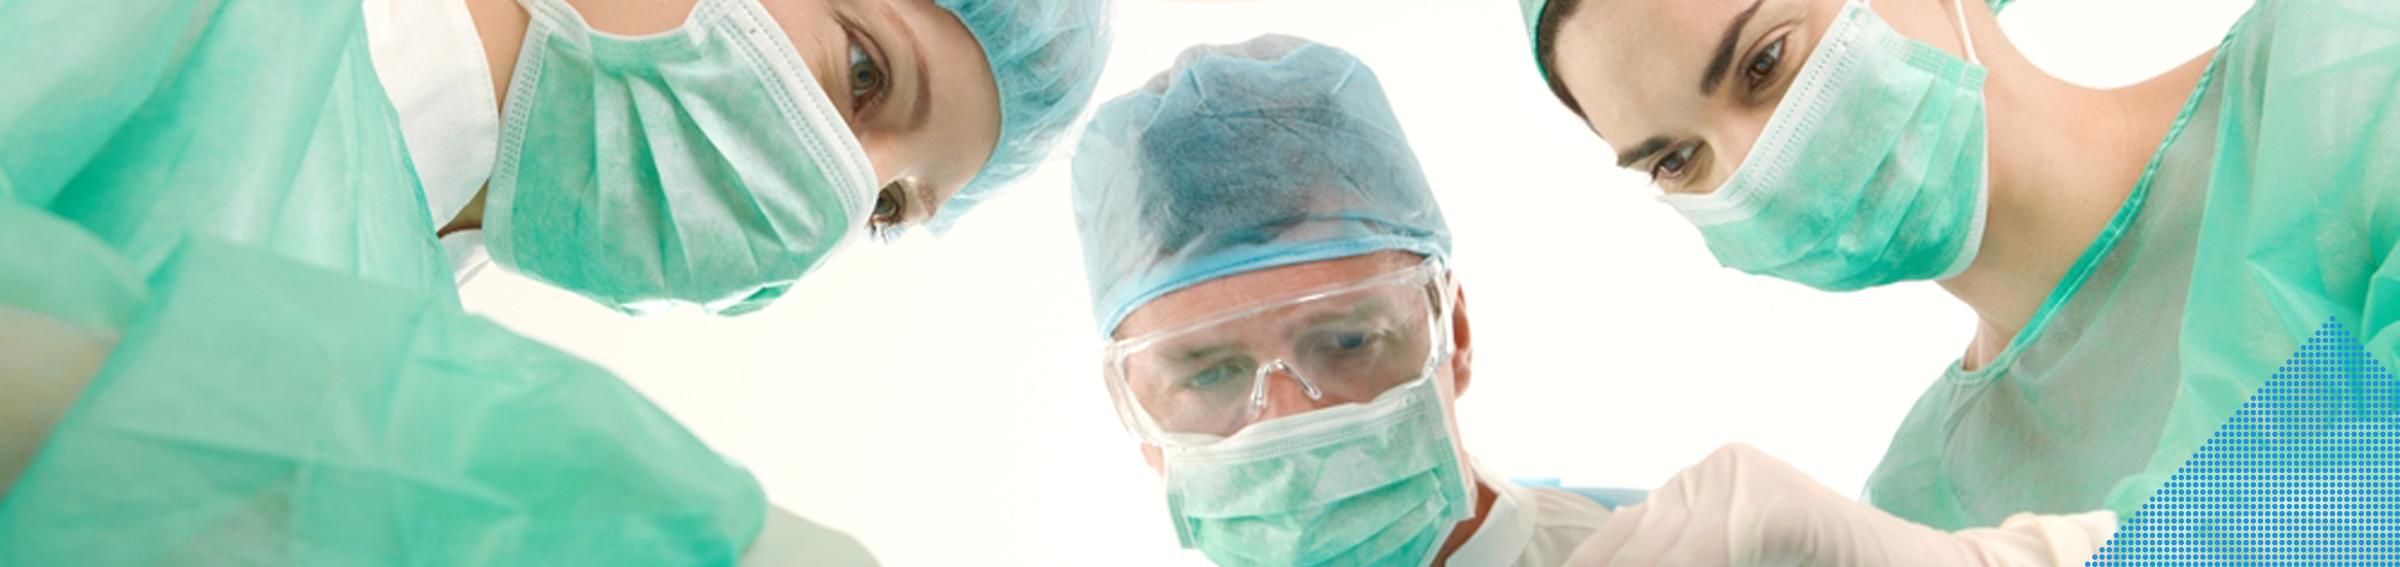 Opieka zdrowotna - Medical fader